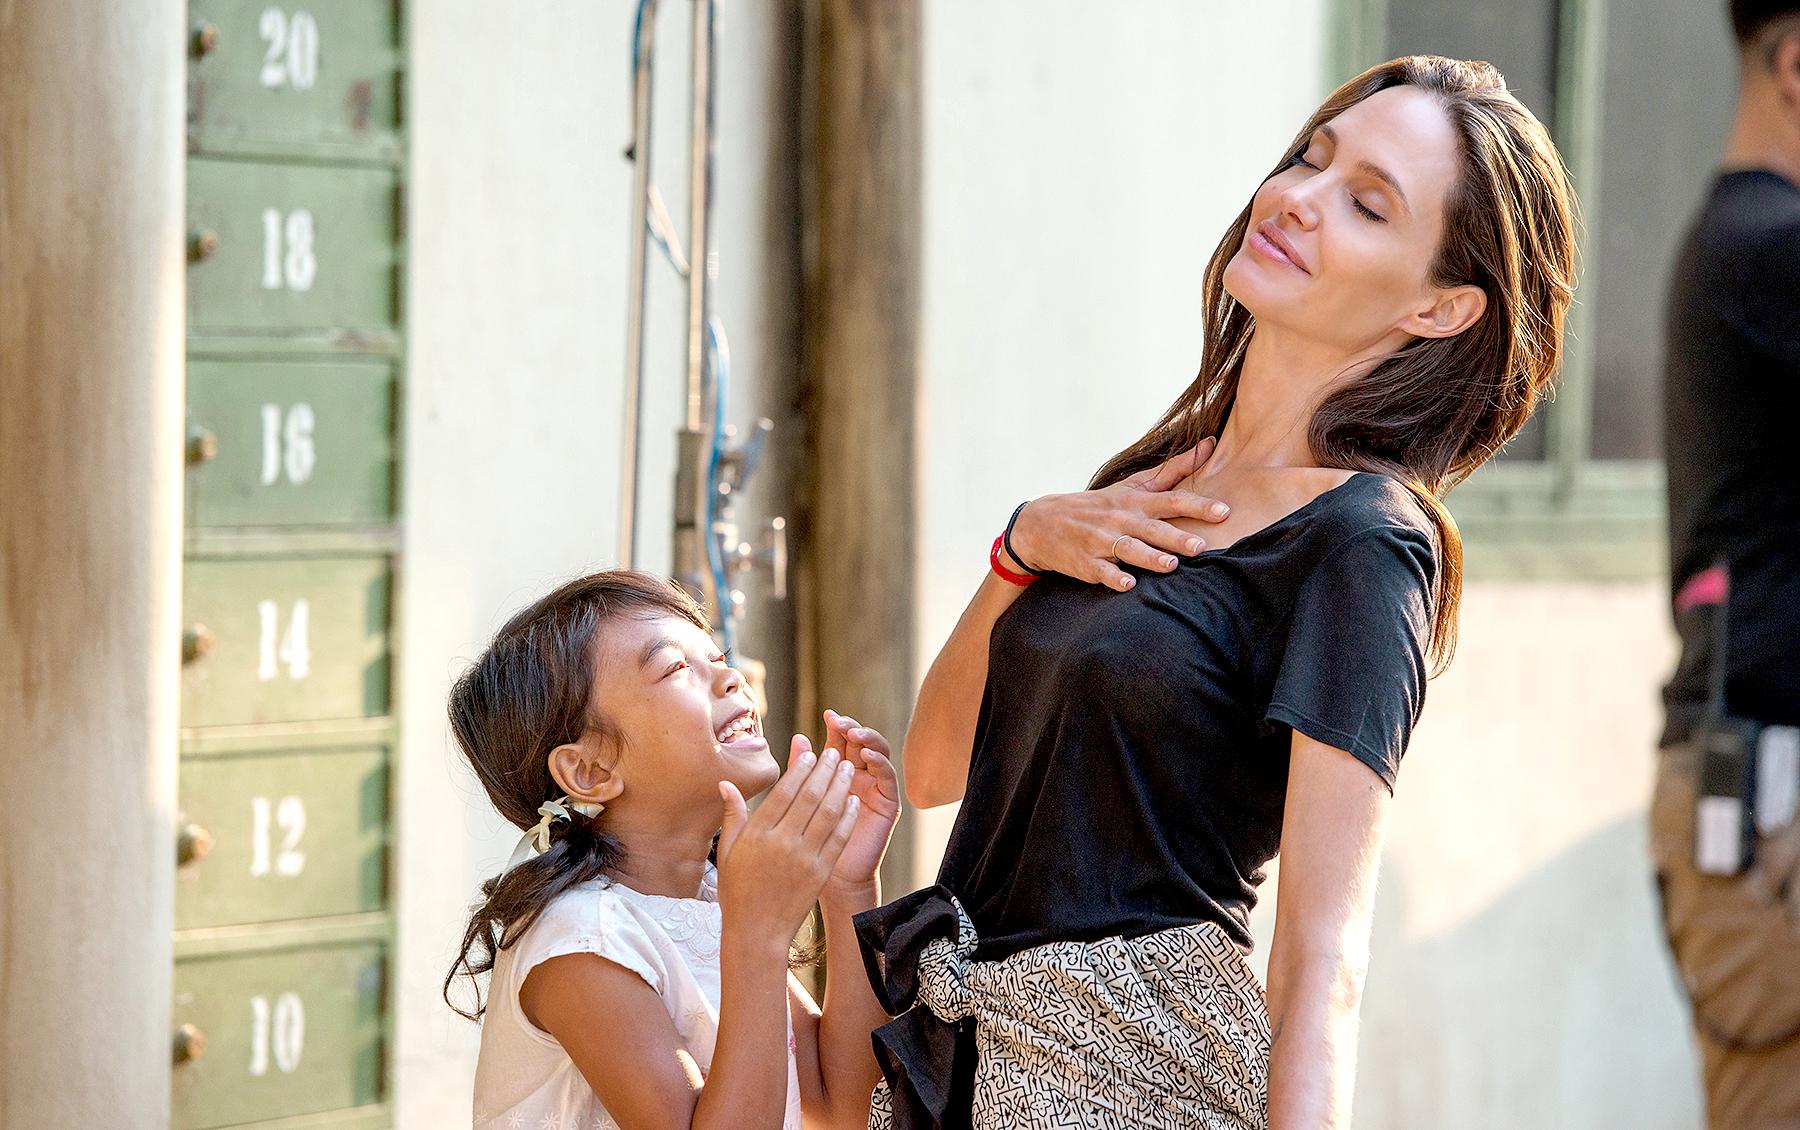 Sareum Srey Moch and Angelina Jolie